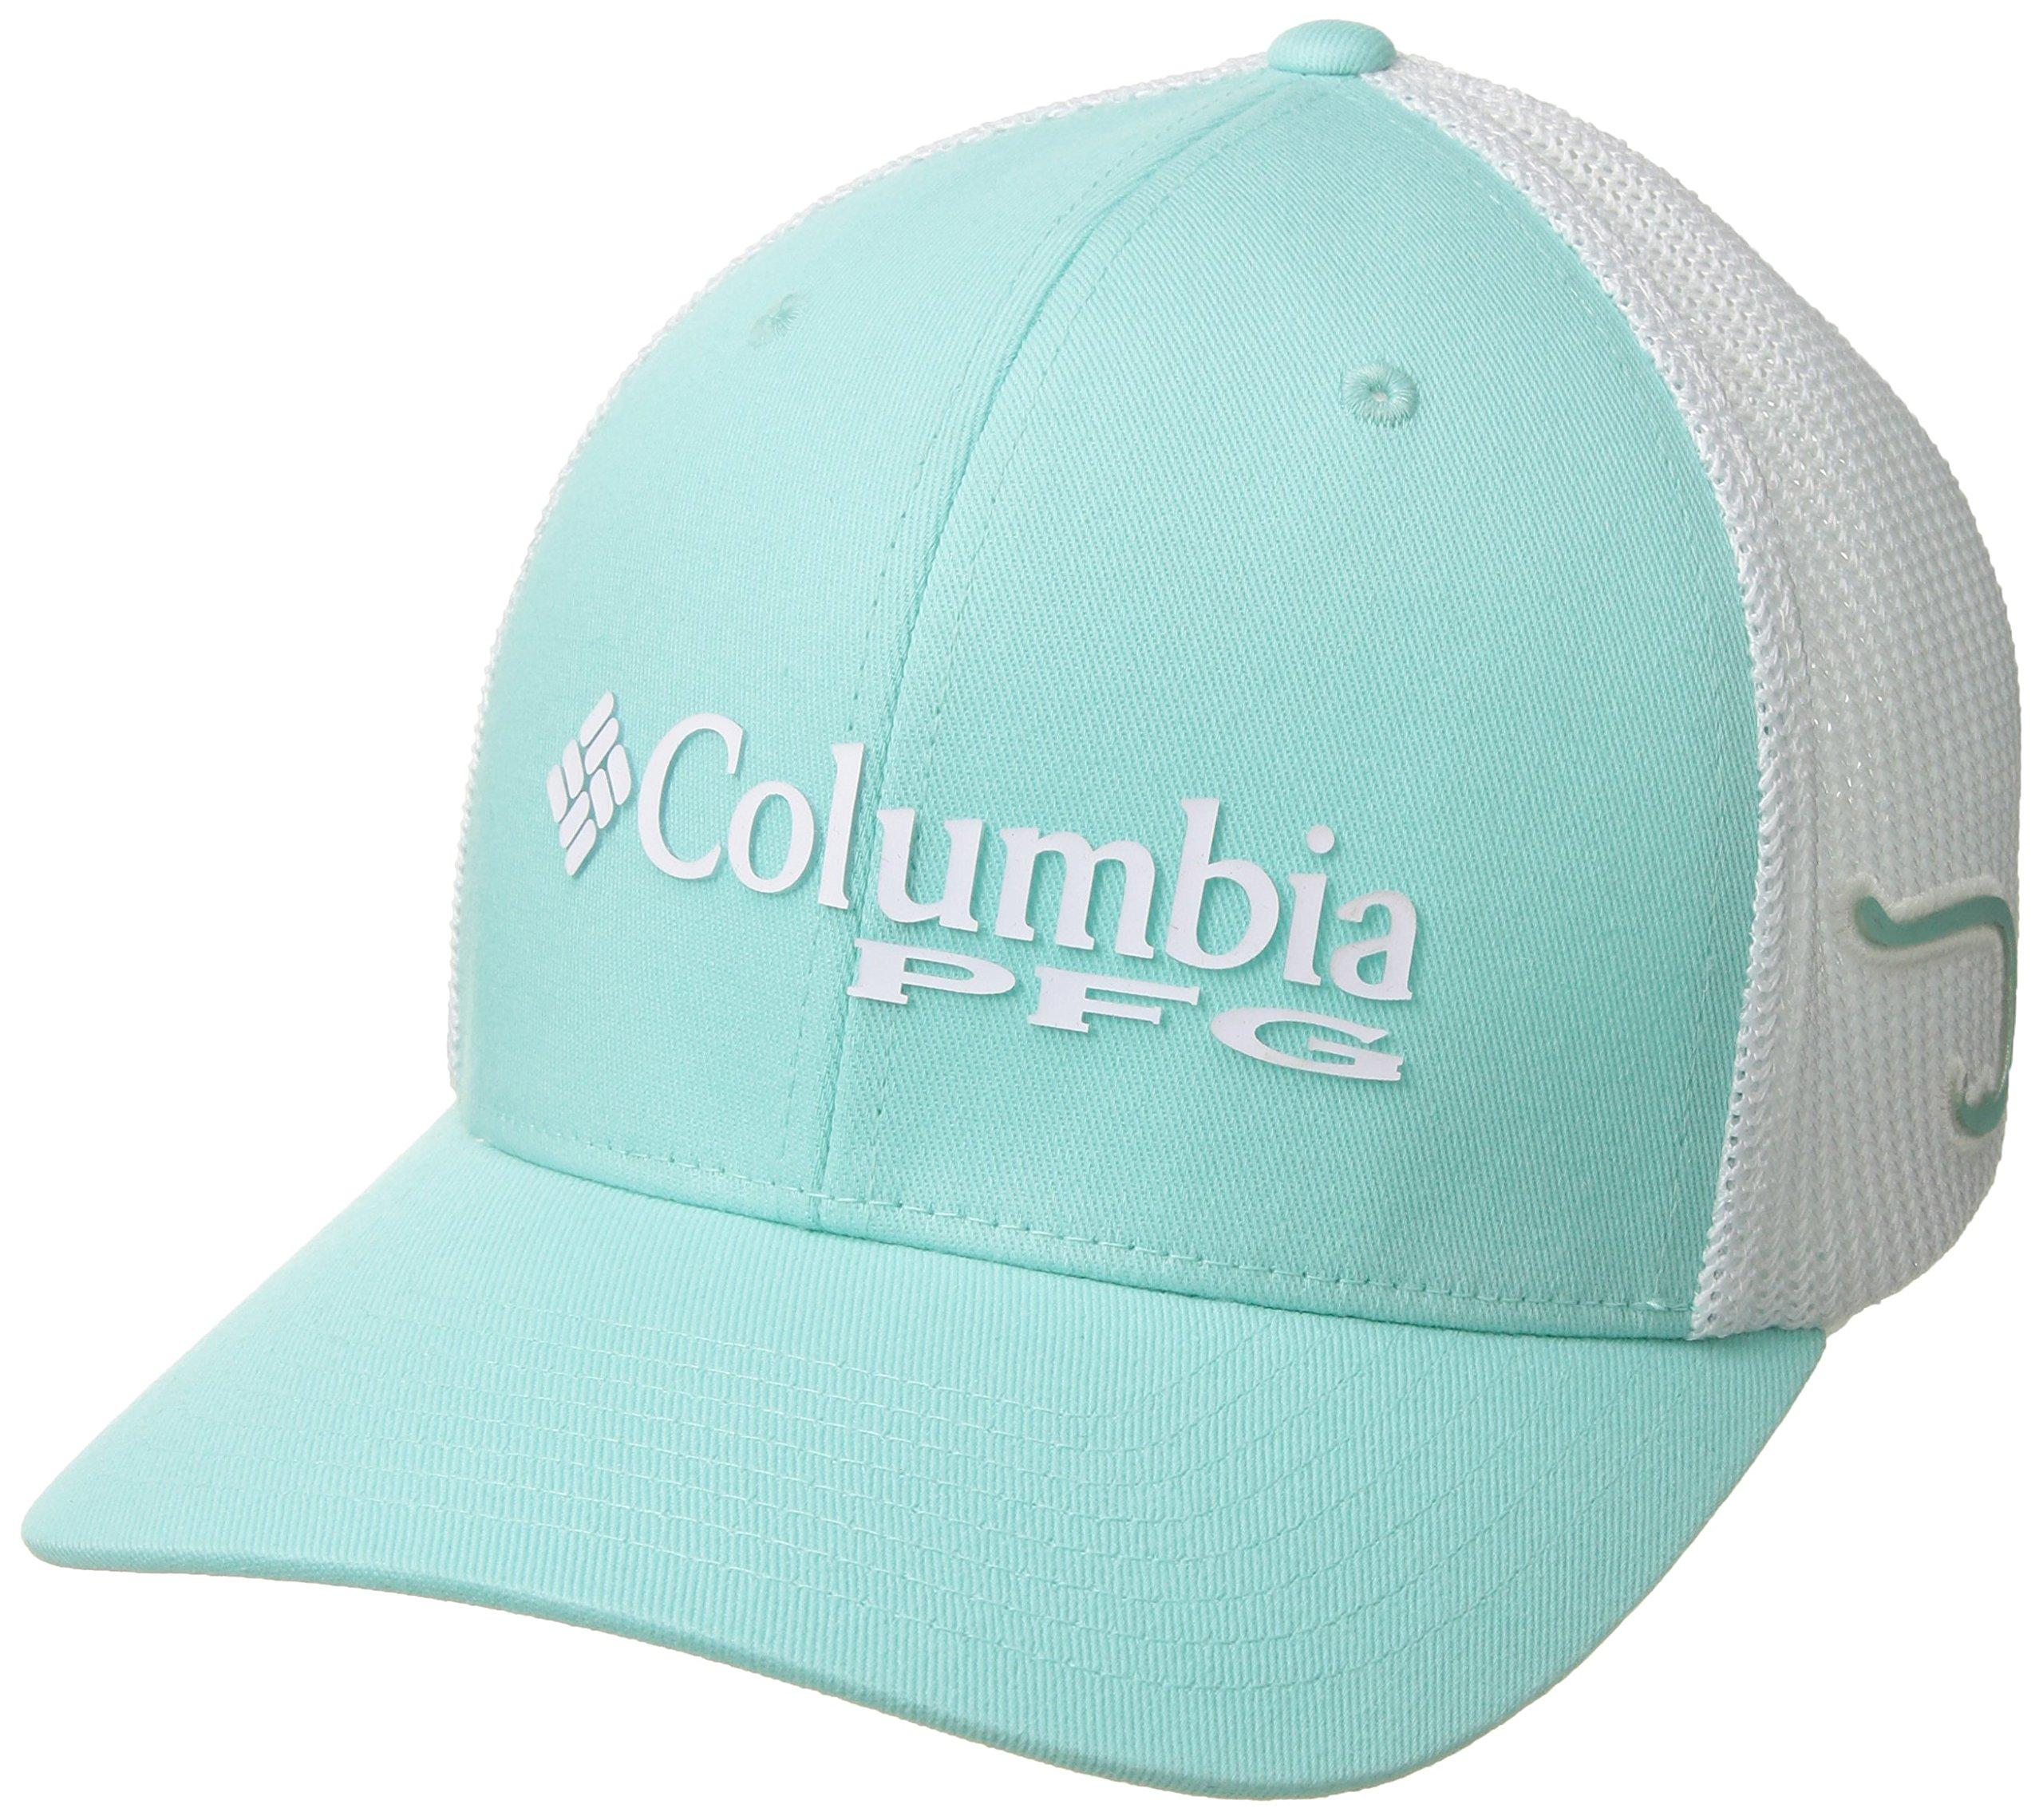 6dea8ad8872 Galleon - Columbia PFG Mesh Ball Cap